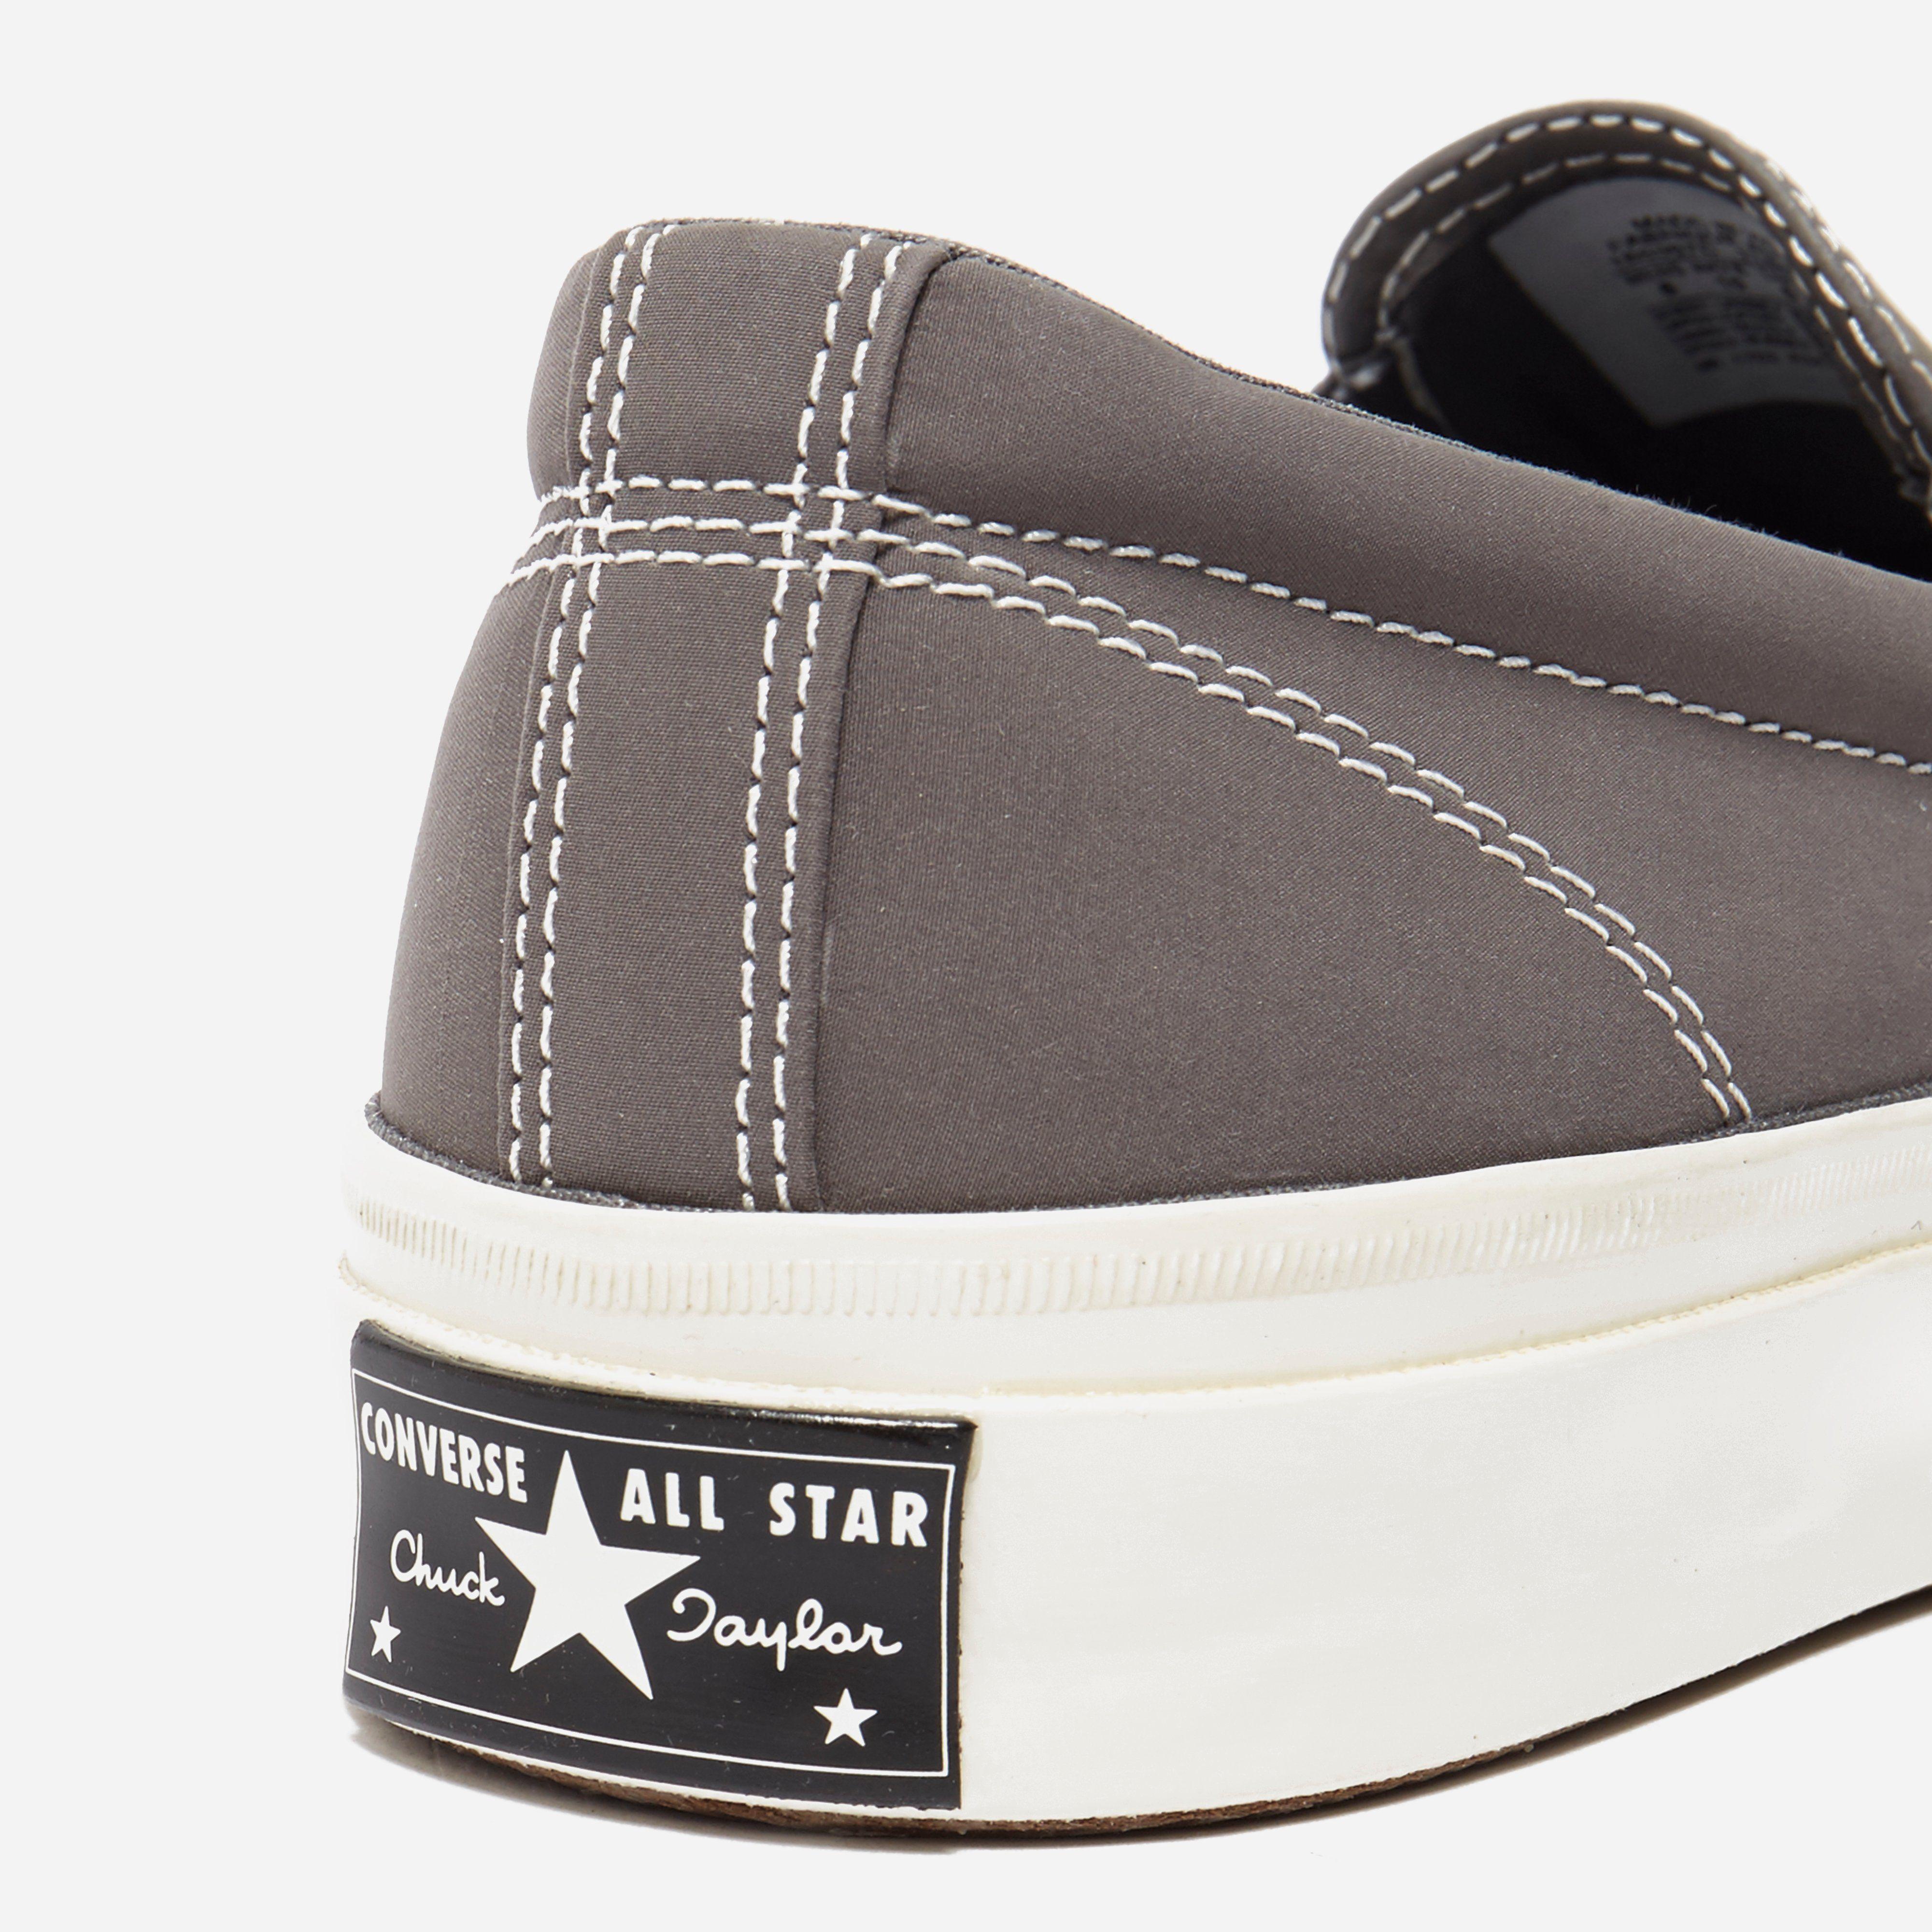 converse gray slip on r9q5  Converse All Star Deck Star 67 Slip On